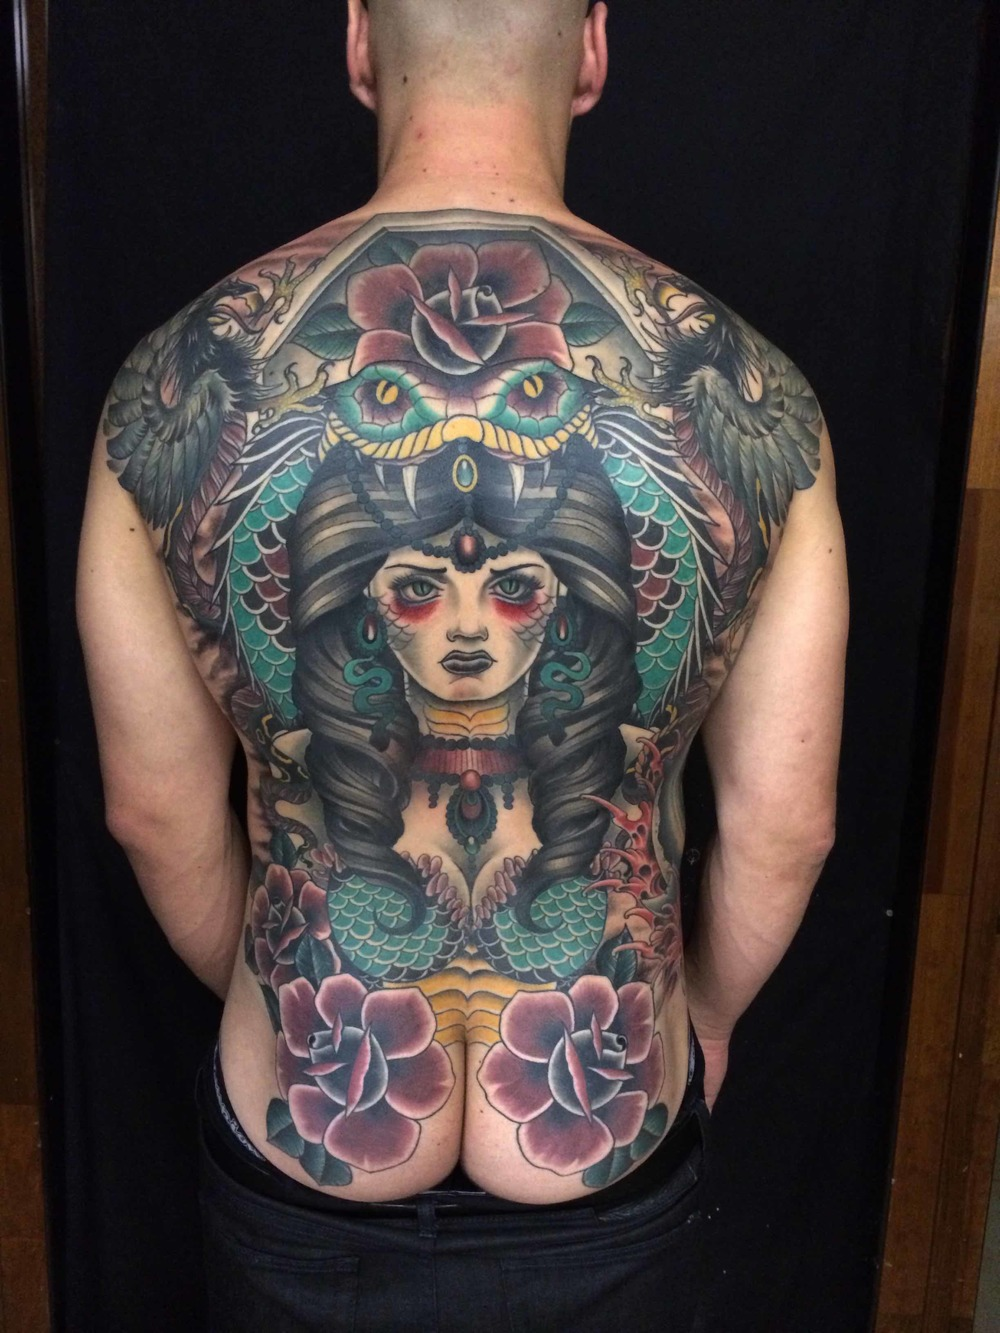 Mike McAskillriverside ca elizabeth st tattoo back.jpeg